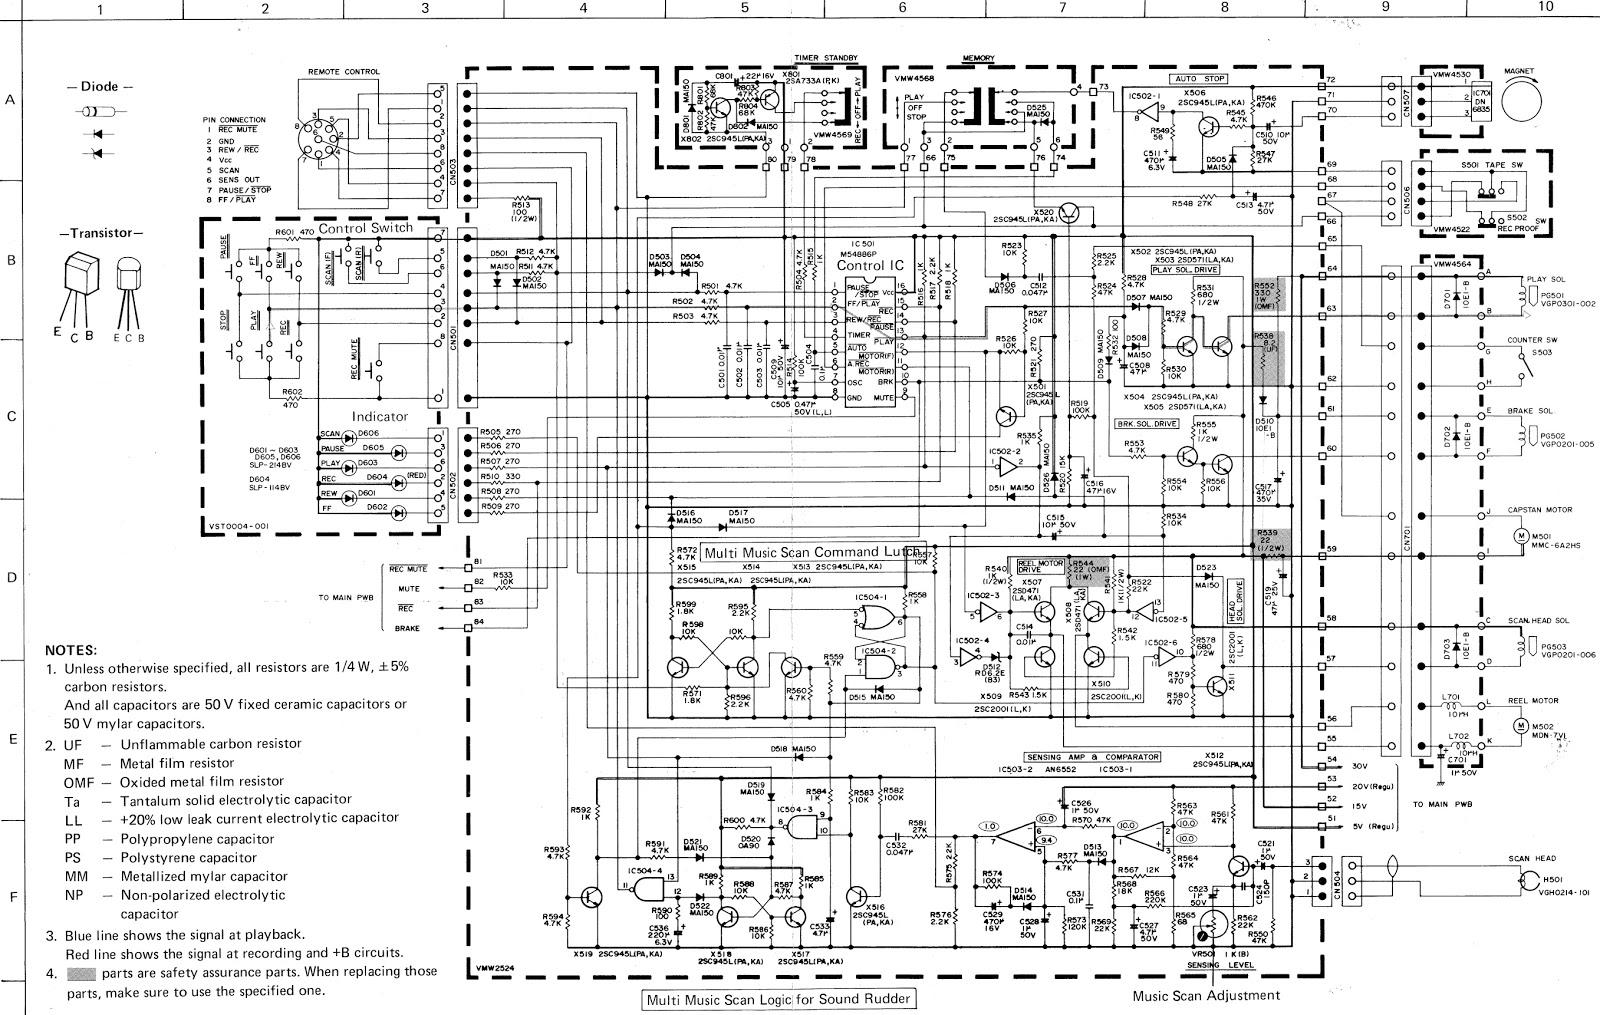 jvc kd a55 gradient cd6500 tape deck circuit diagram wiring tape deck wiring diagram pwb  [ 1600 x 1015 Pixel ]